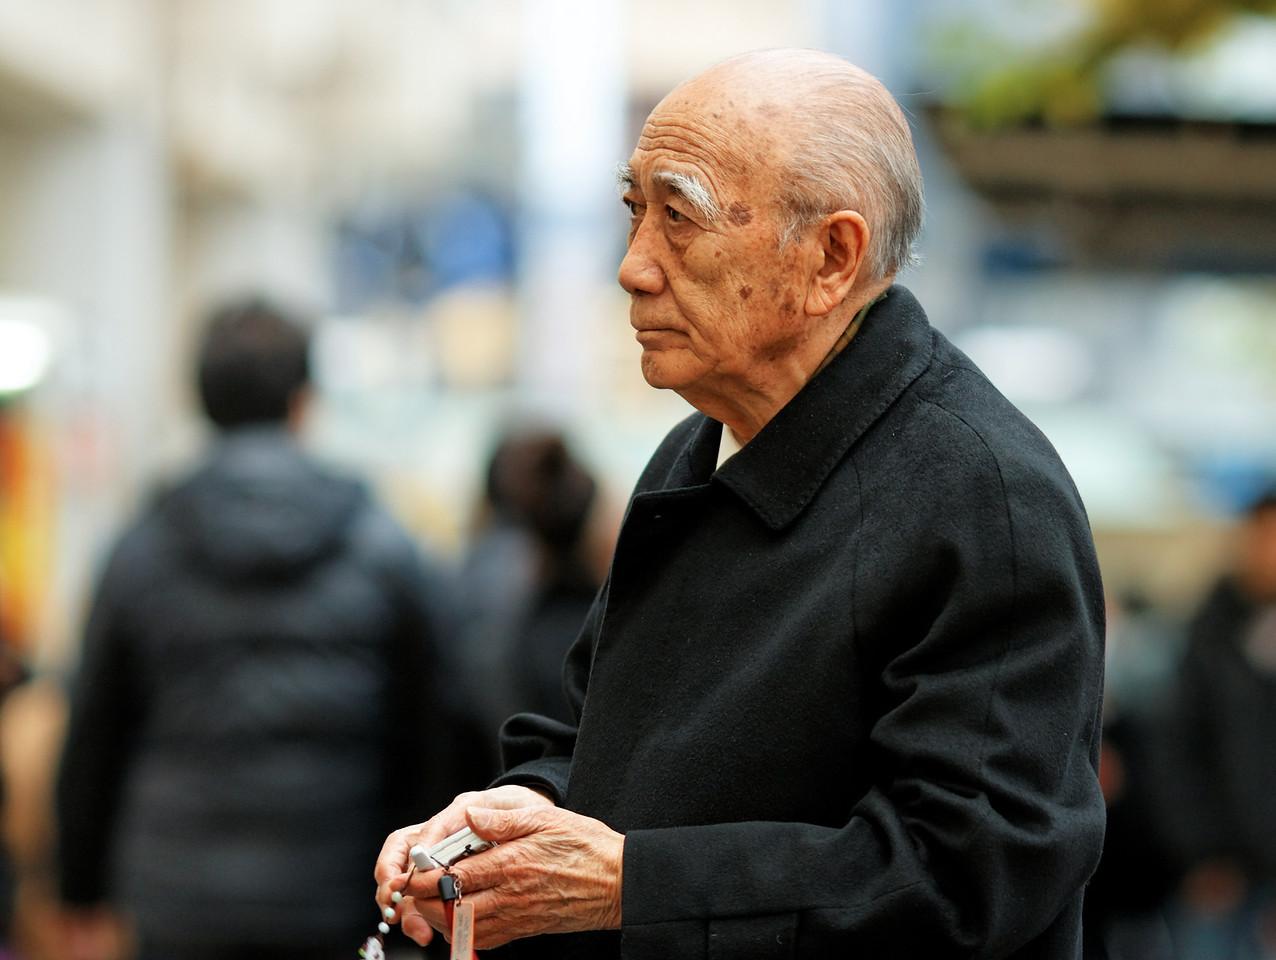 IMAGE: http://photo.mellbin.com/Japan/Tokyo-Street-Portraits-Daytime/IMG9059Dx2raw/803415029_u5bbk-X2.jpg